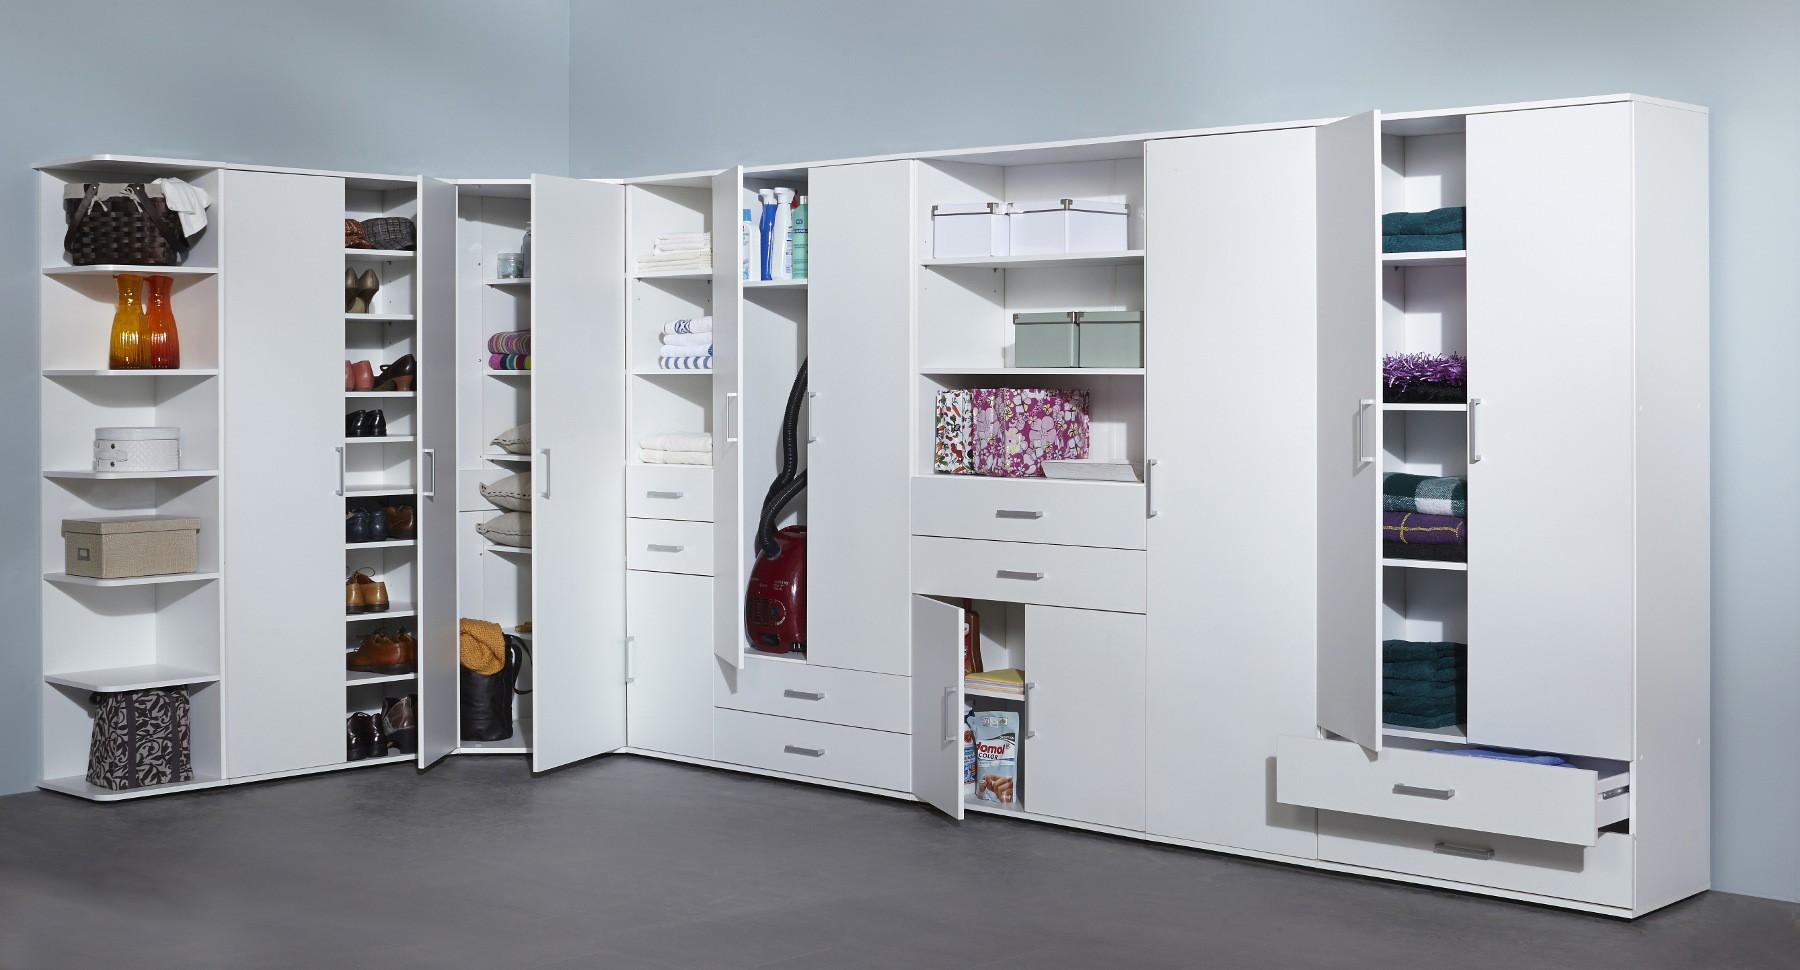 m bel hauswirtschaftsraum badezimmer schlafzimmer sessel m bel design ideen. Black Bedroom Furniture Sets. Home Design Ideas